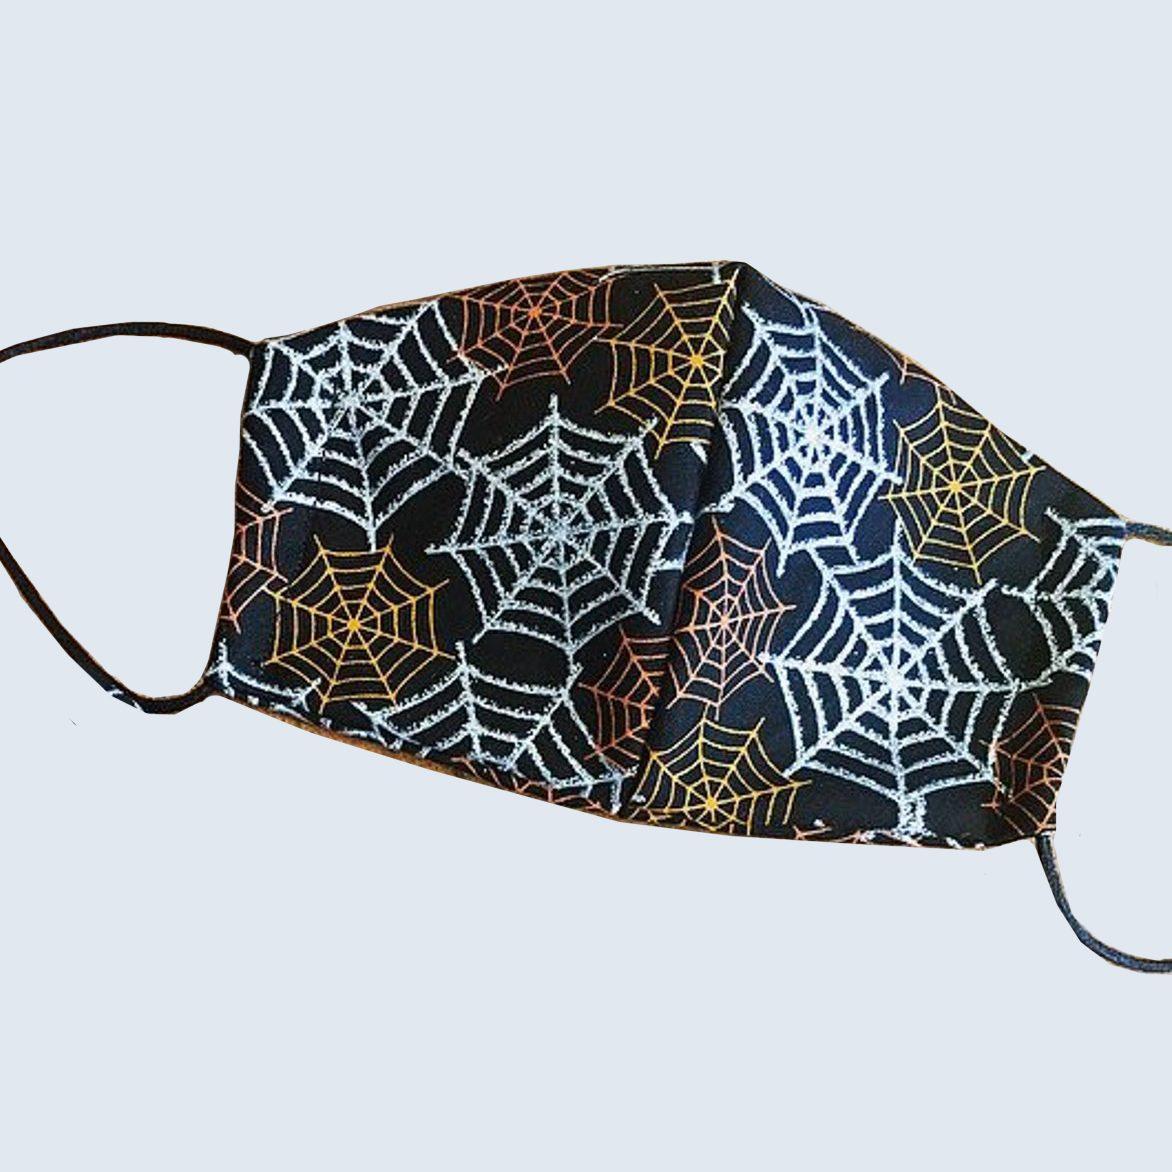 Sparkling spider web mask and scrunchie